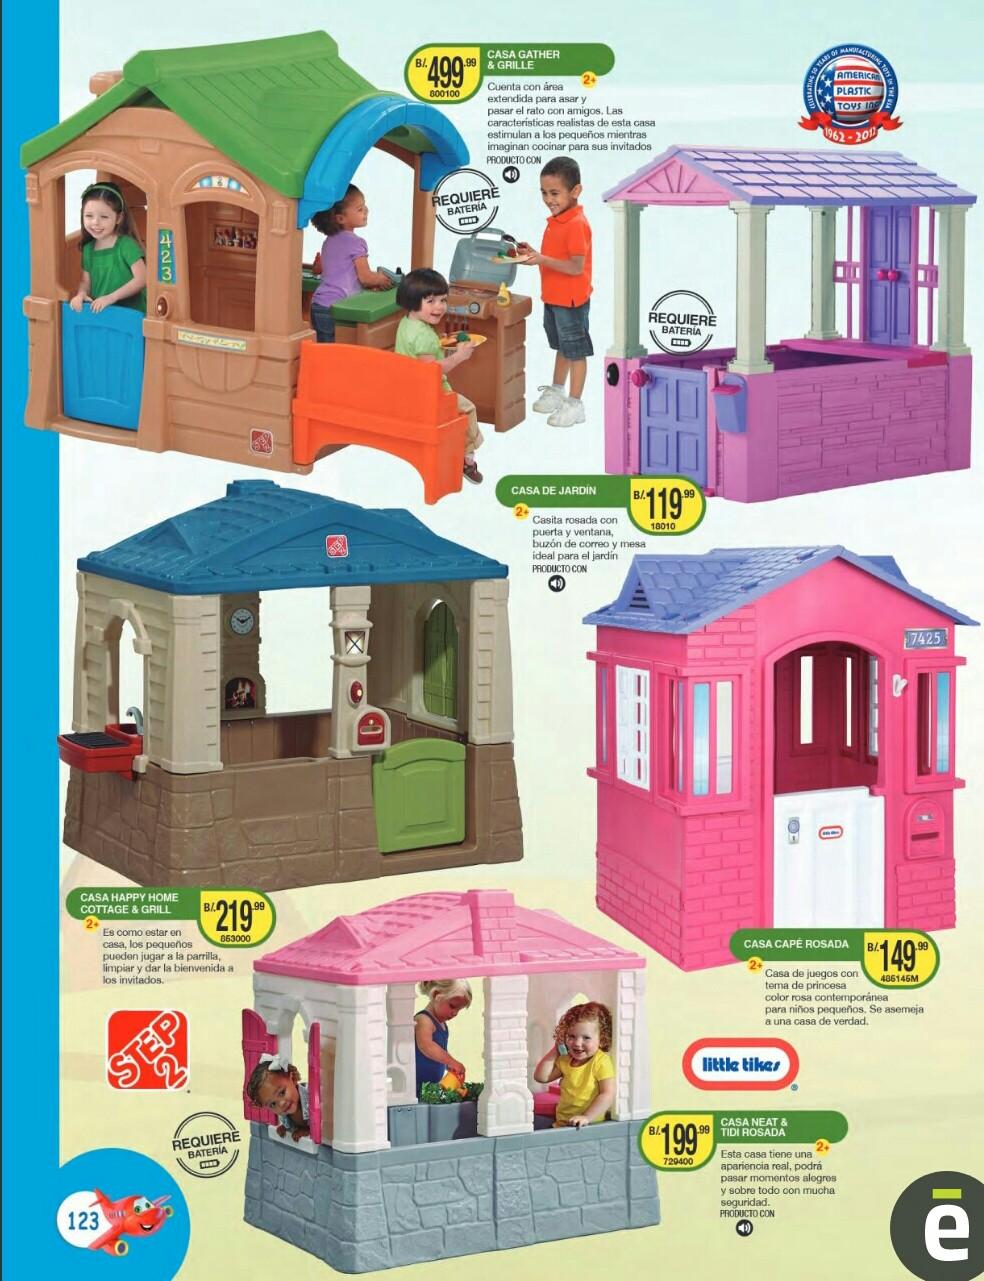 Catalogo juguetes Titan Toys 2019 p123